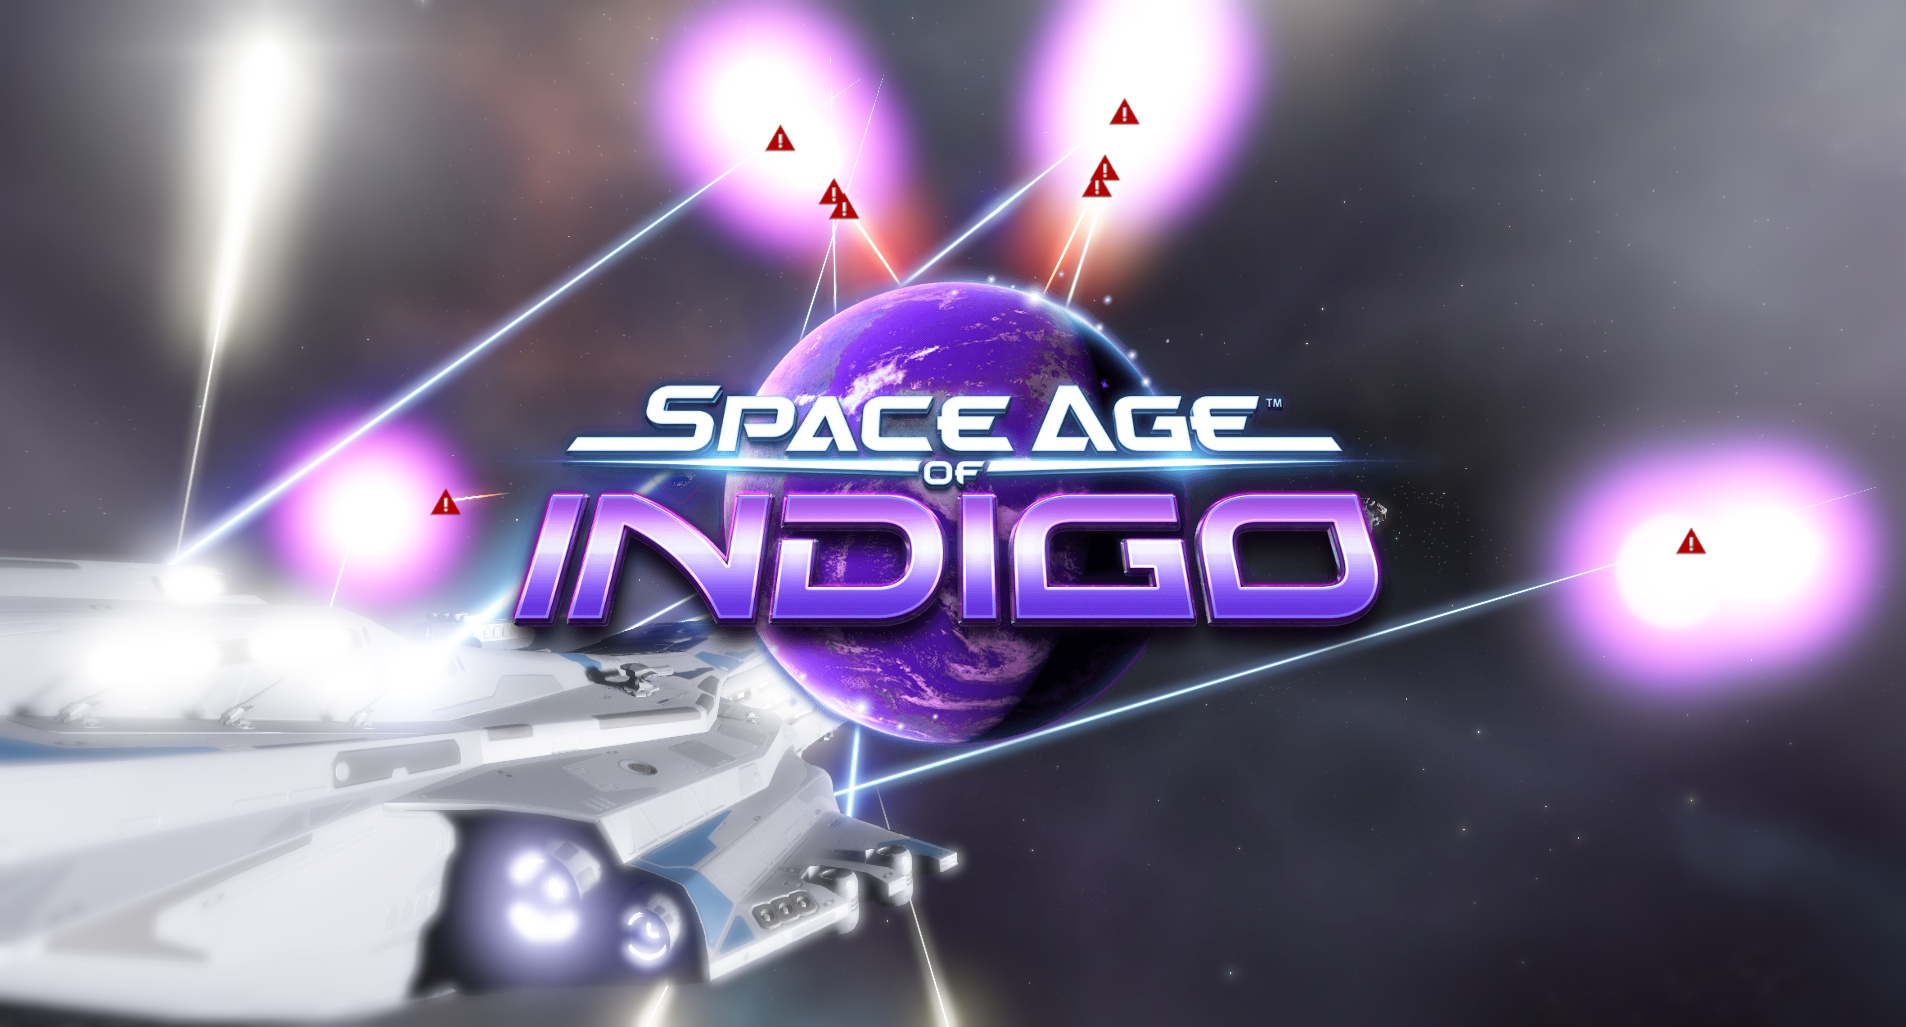 Space Age of Indigo